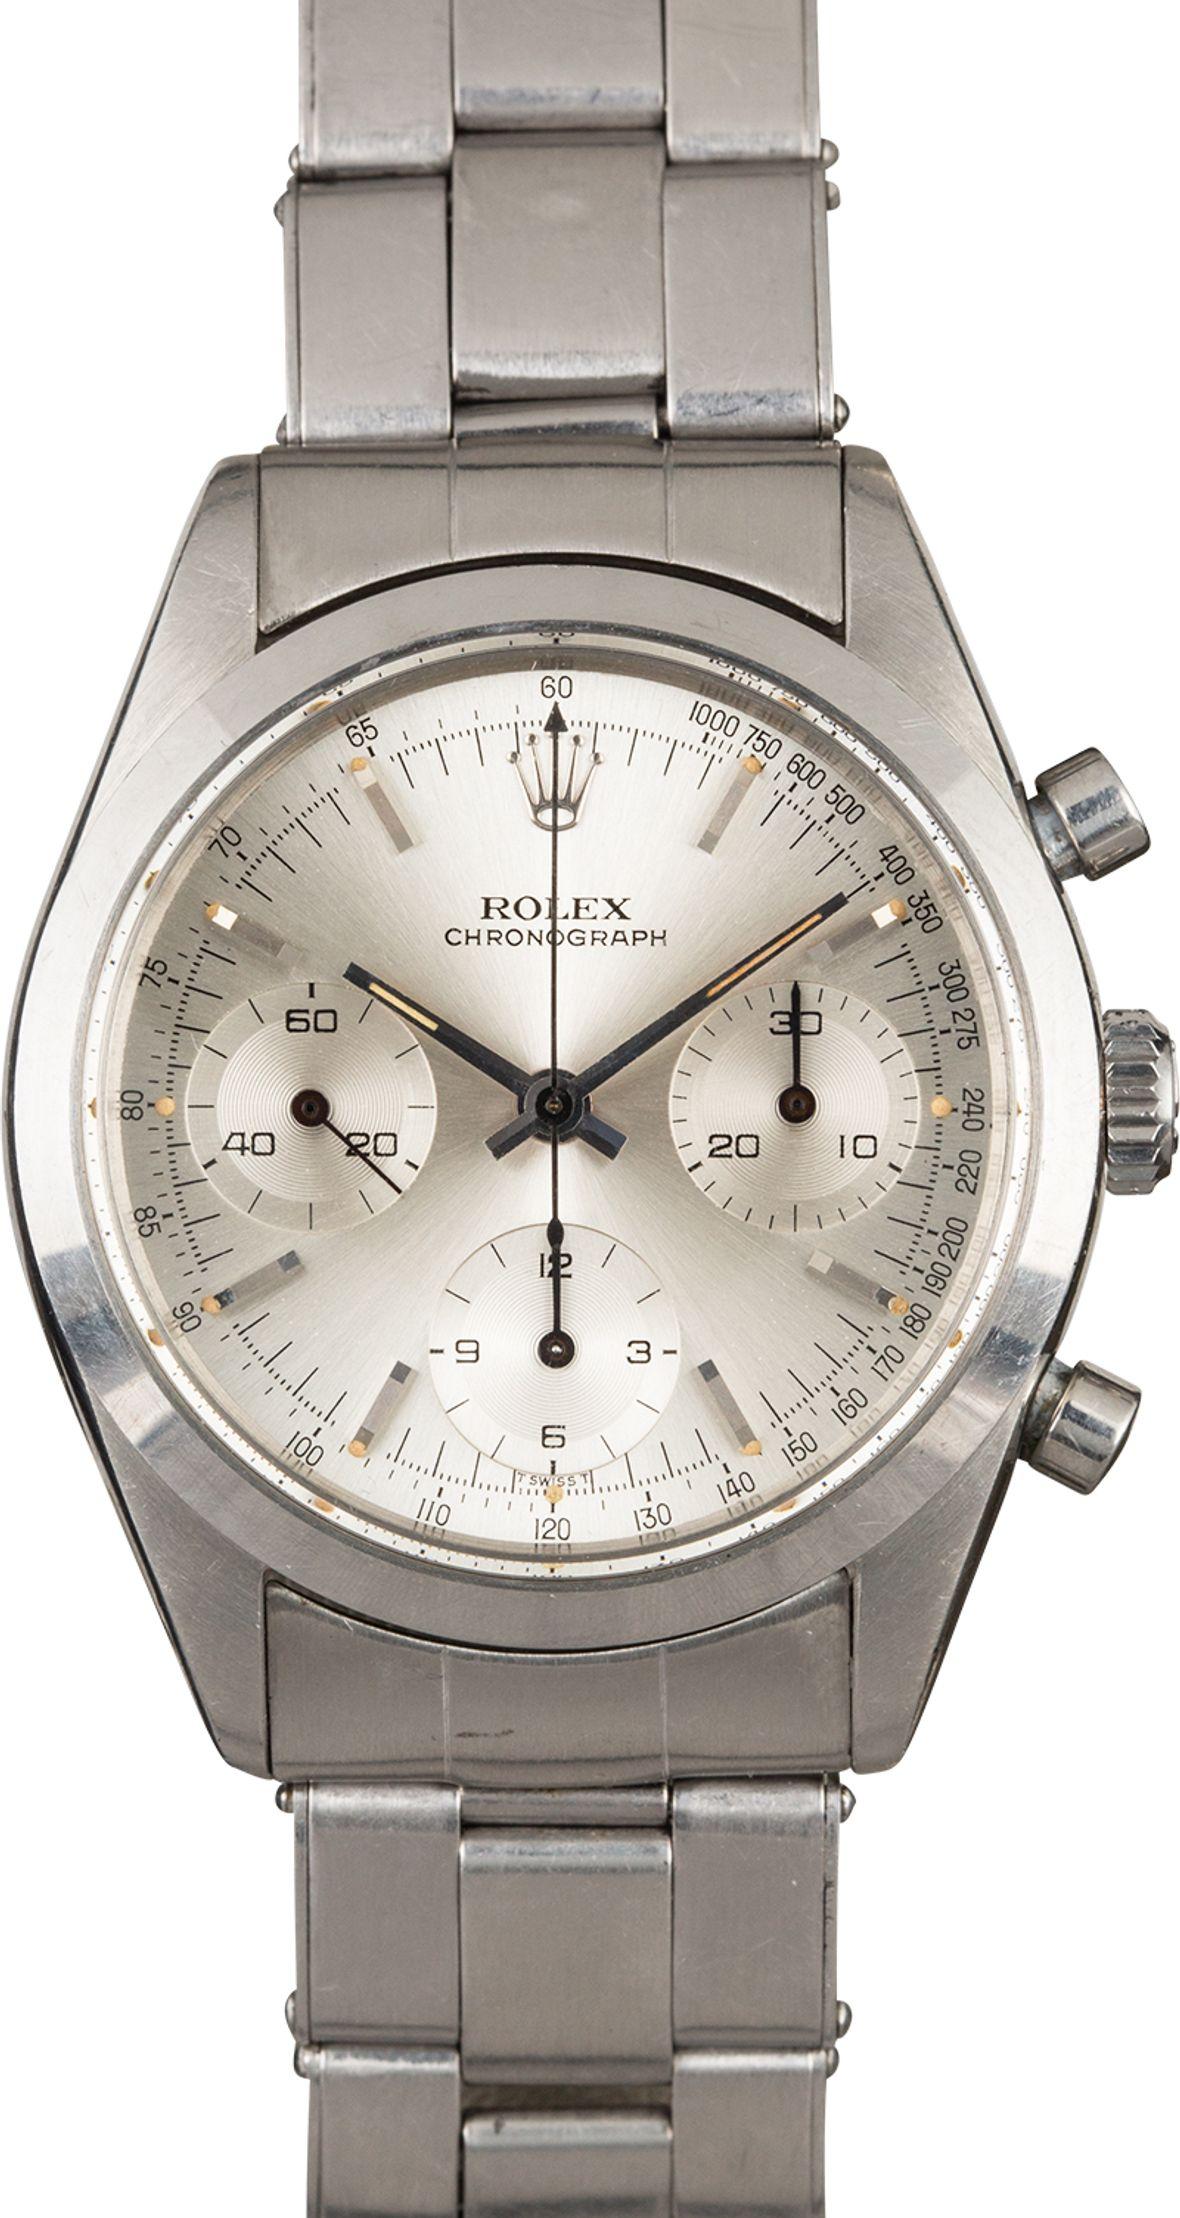 James Bond Rolex Pre-Daytona Chronograph 6238